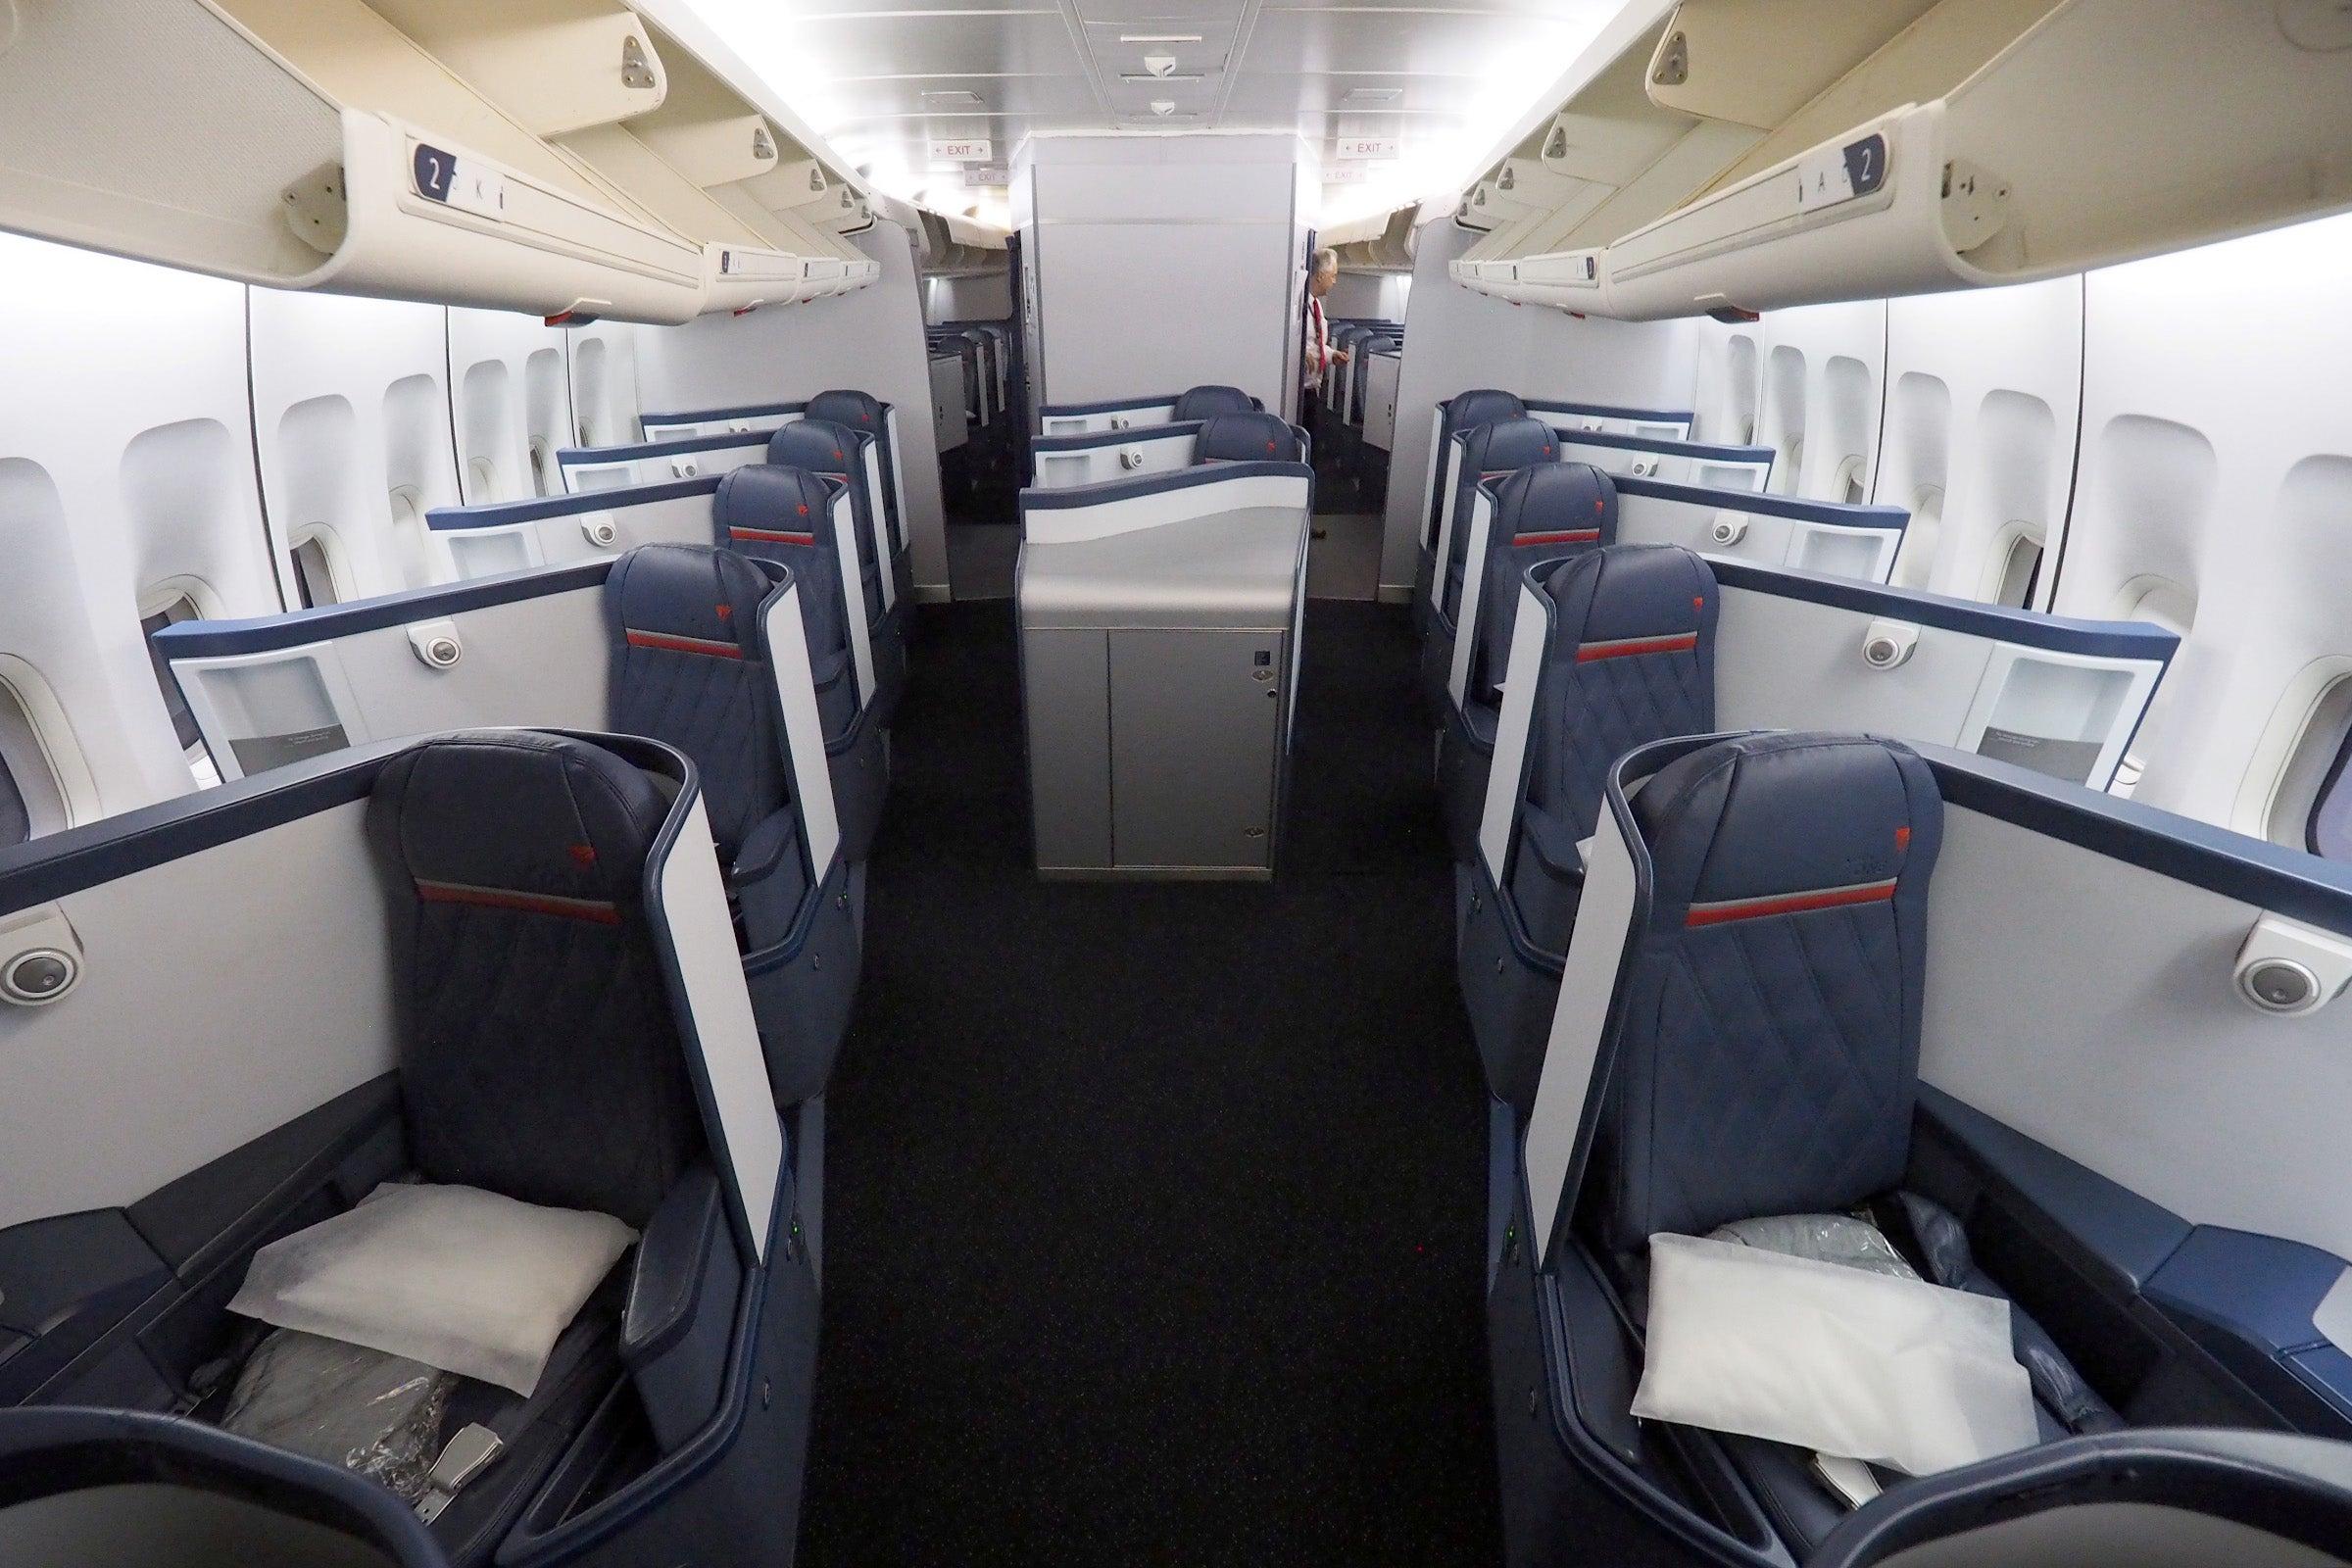 delta s final domestic 747 flight was one big party